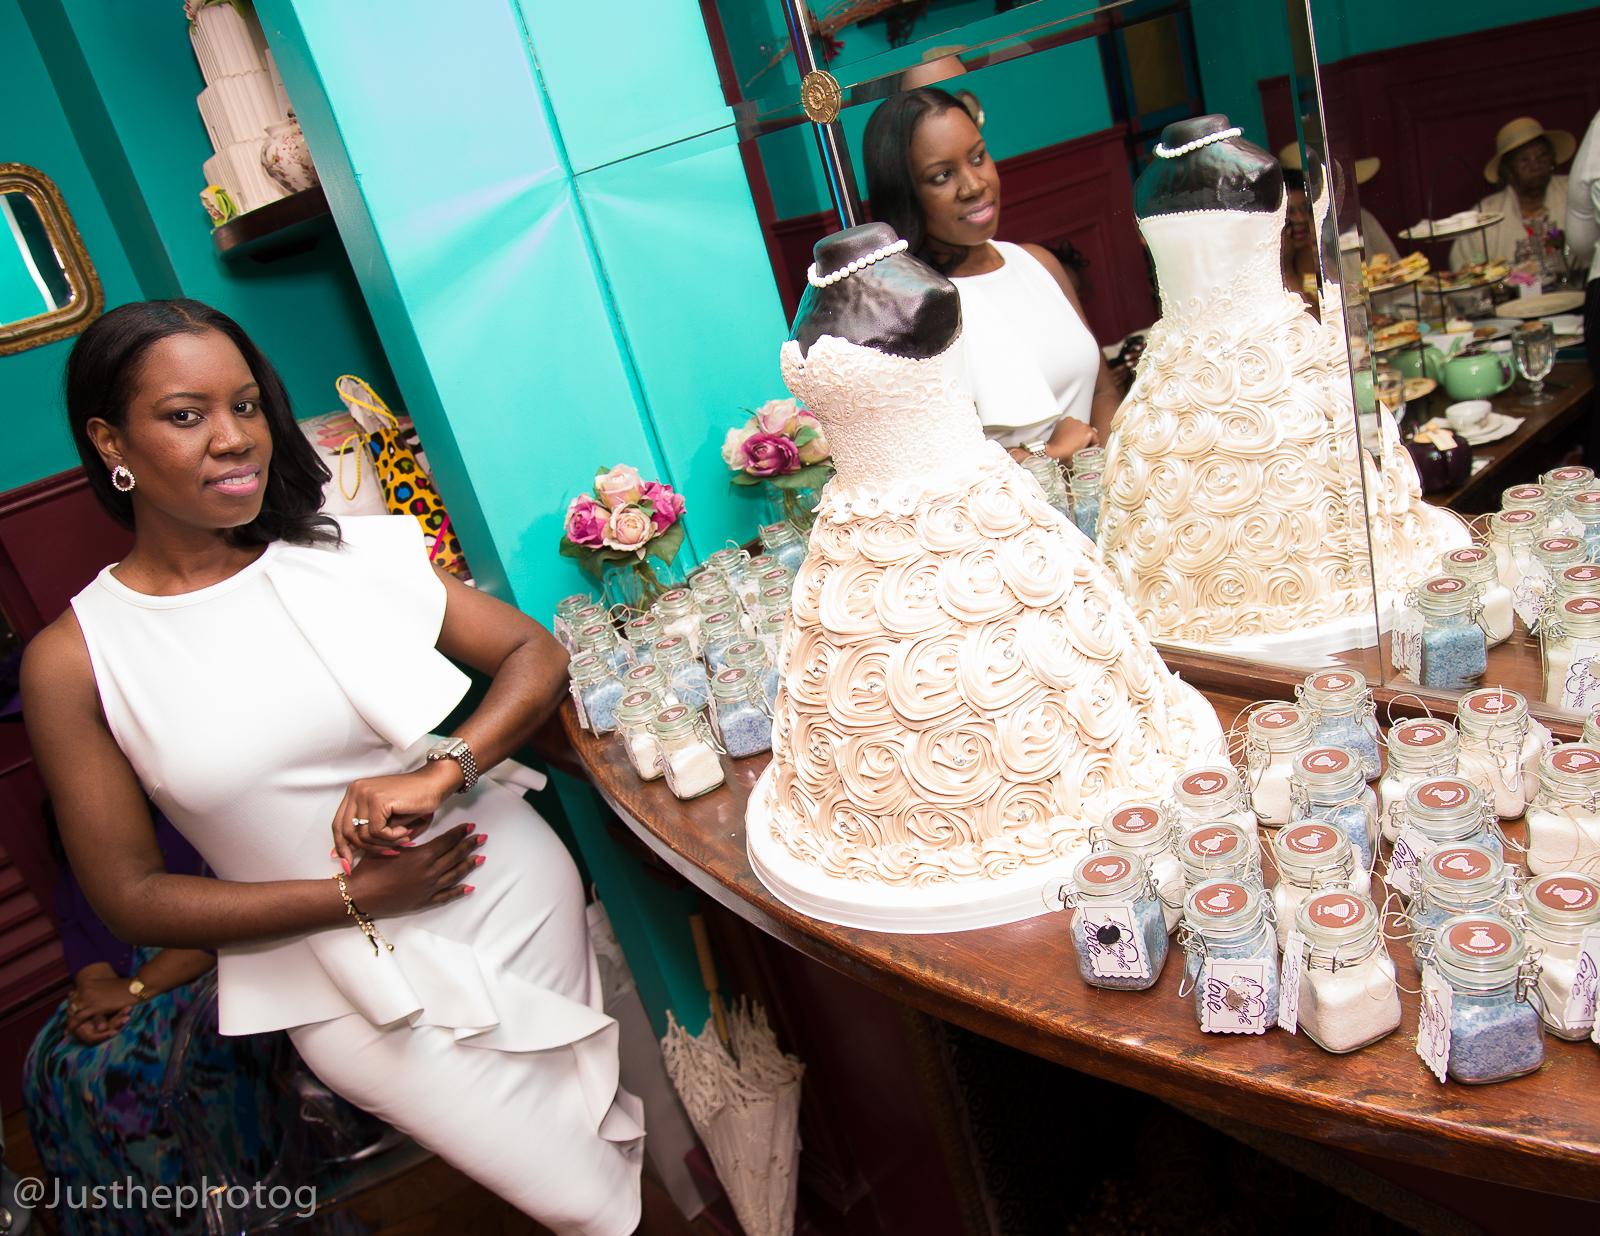 jules the coordinated bride _dsc5033